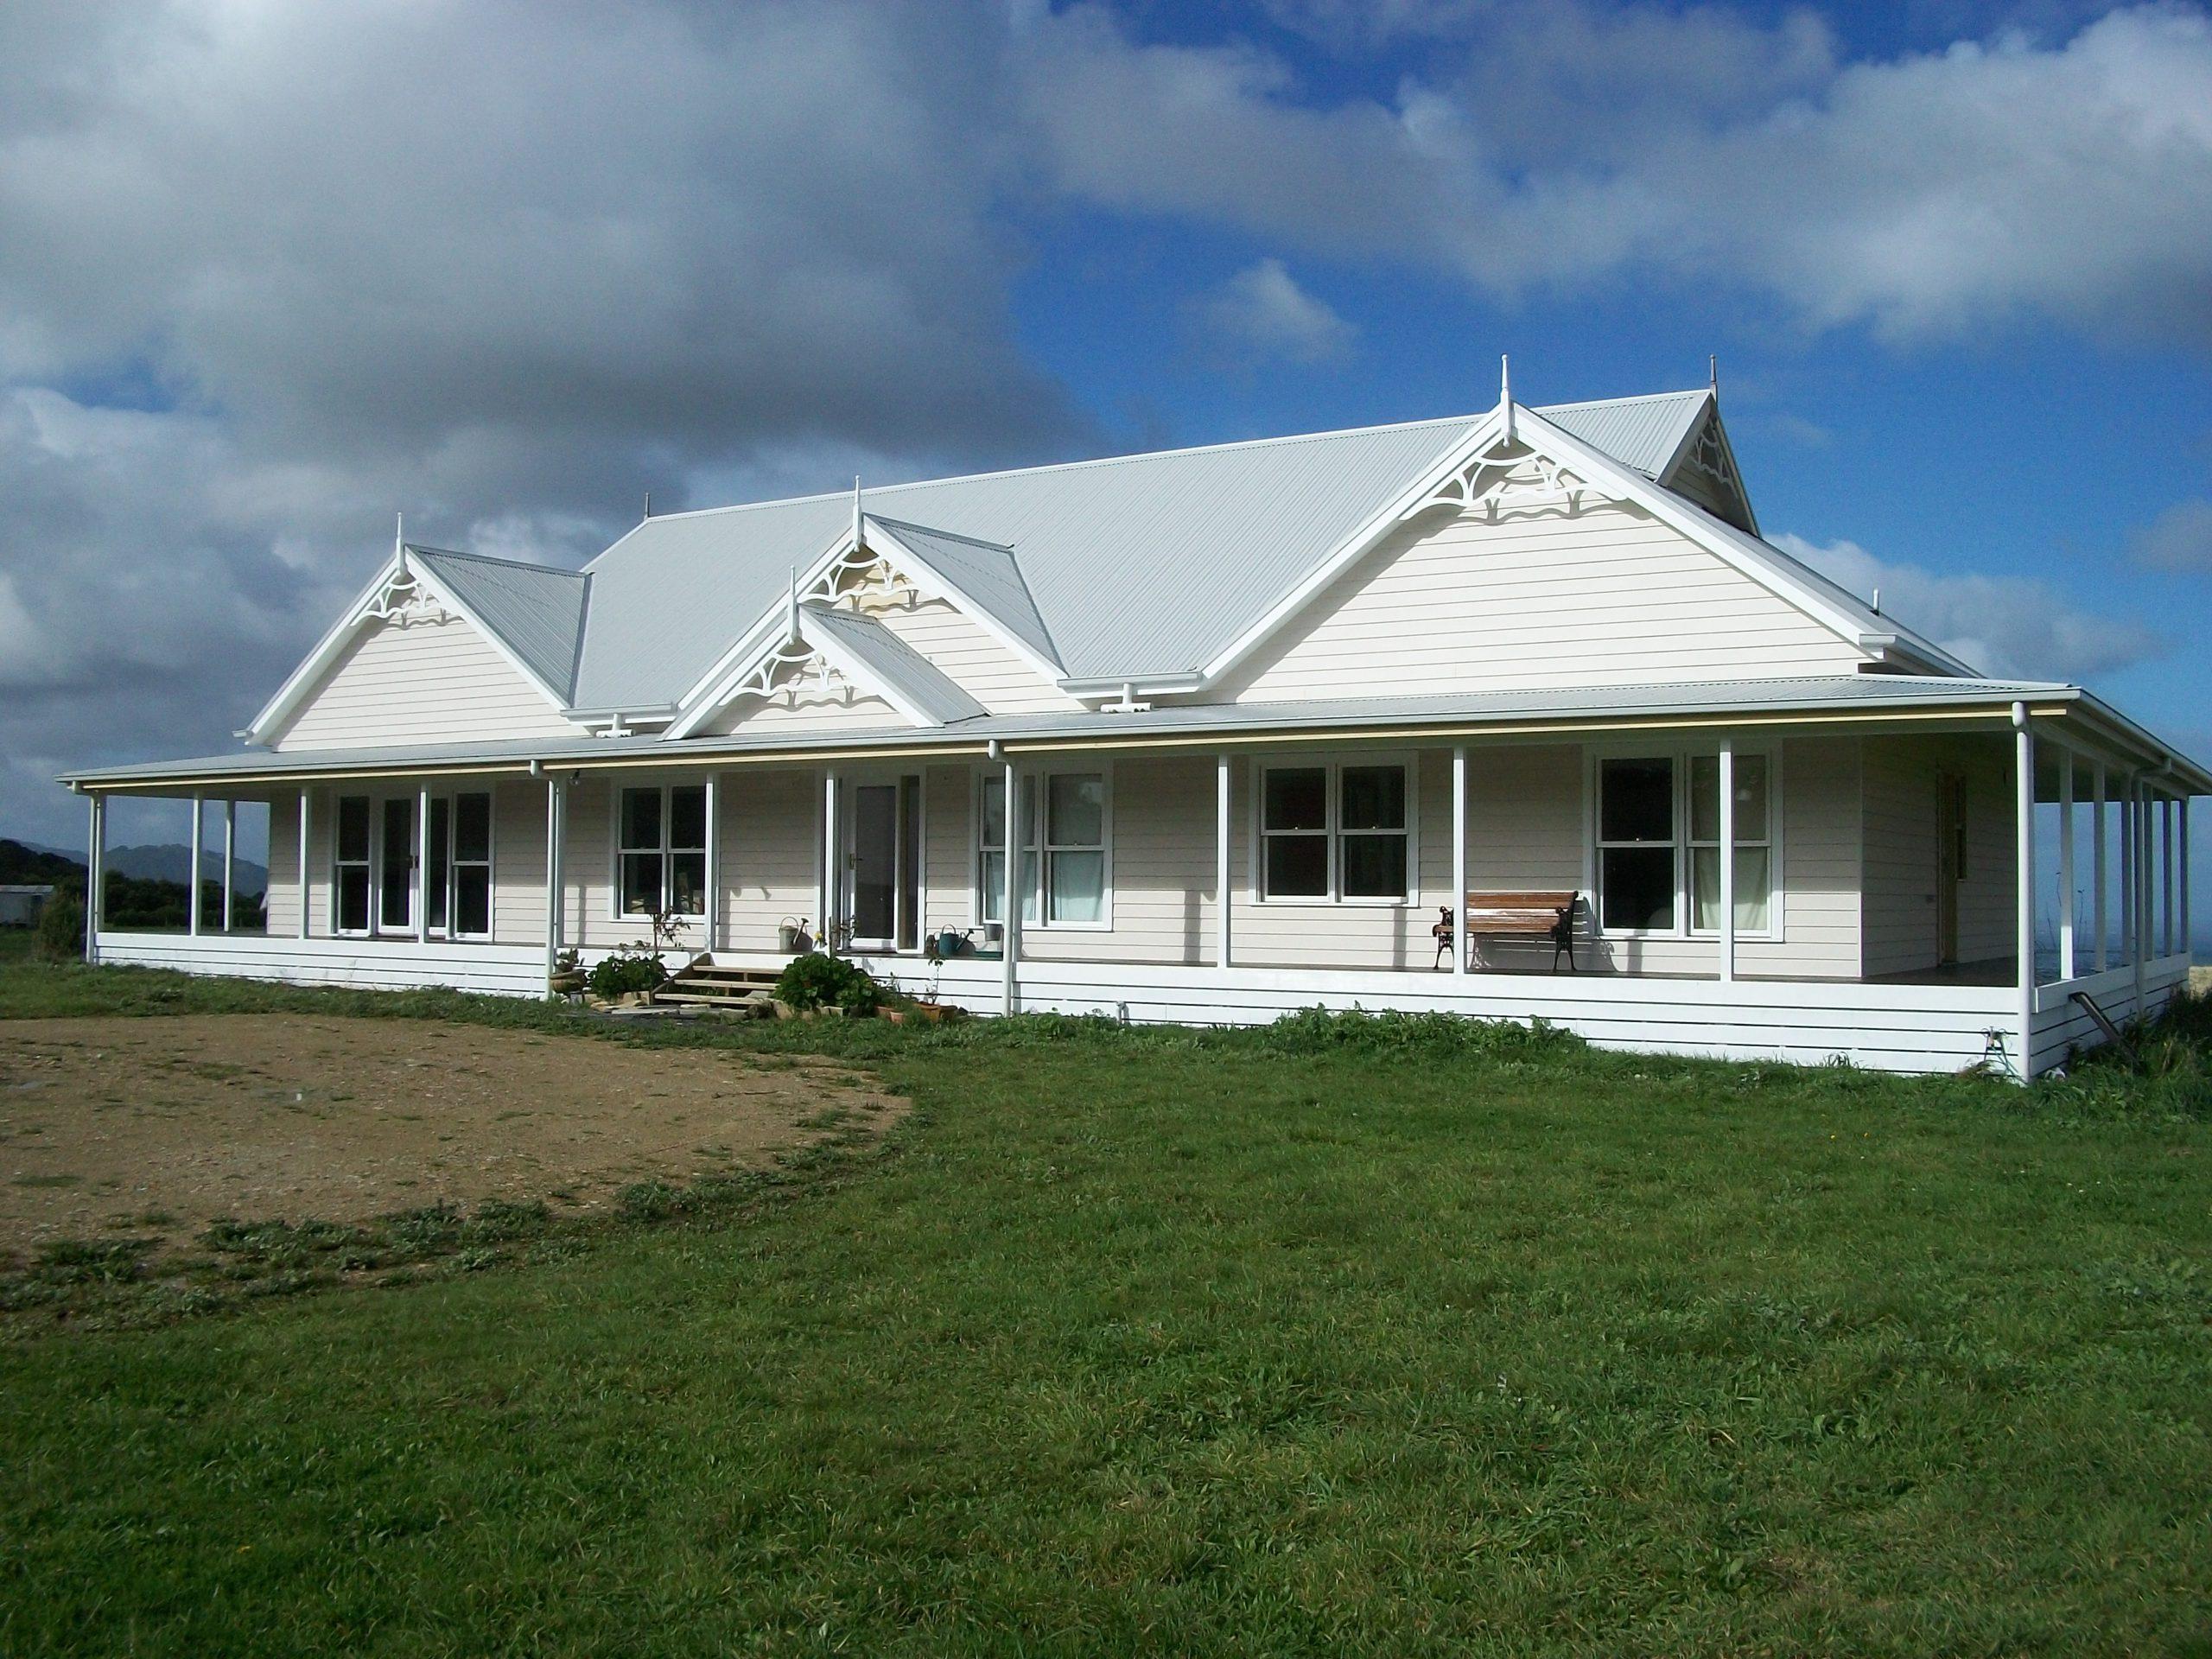 O'Grady's Ridge - Twin Gables, a double verandah line and Dutch Gables create a timeless, traditional roof line built by Farm Houses of Australia